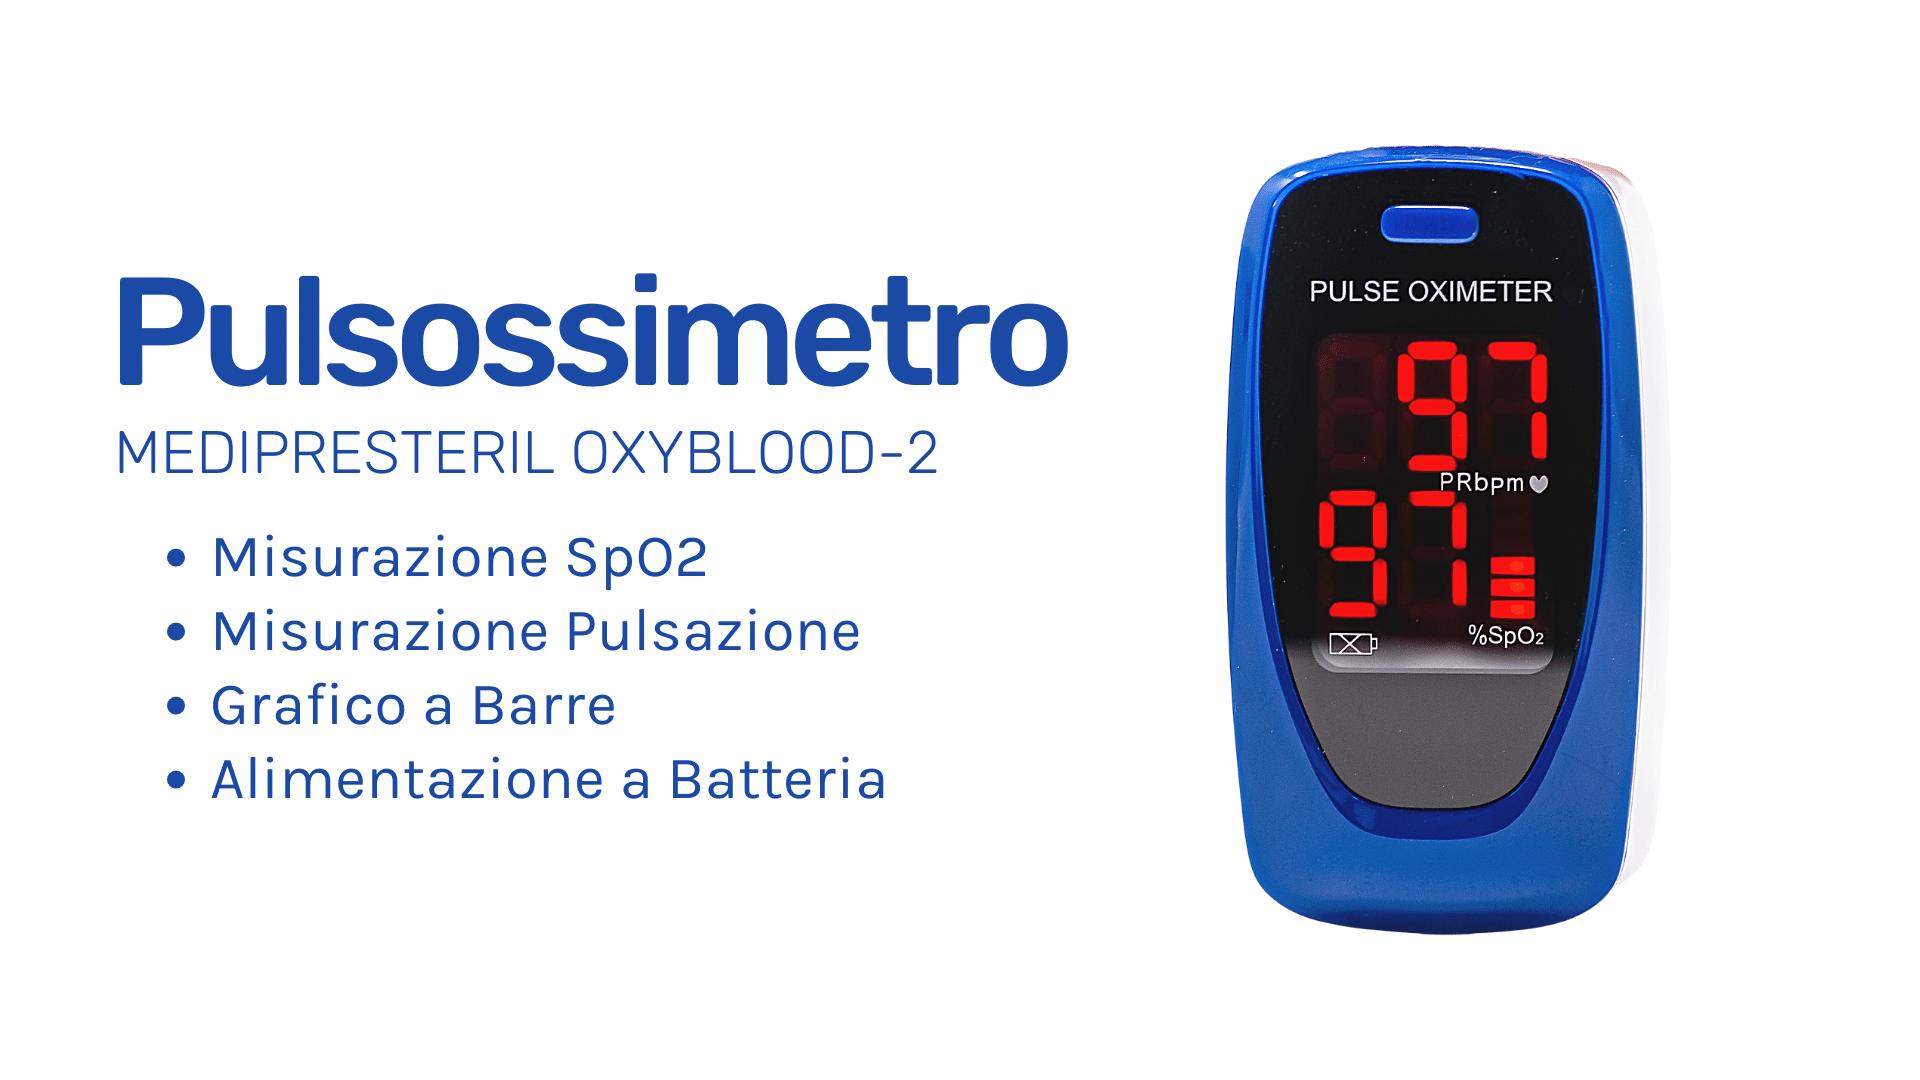 Pulsossimetro Medipresteril OxyBlood-2